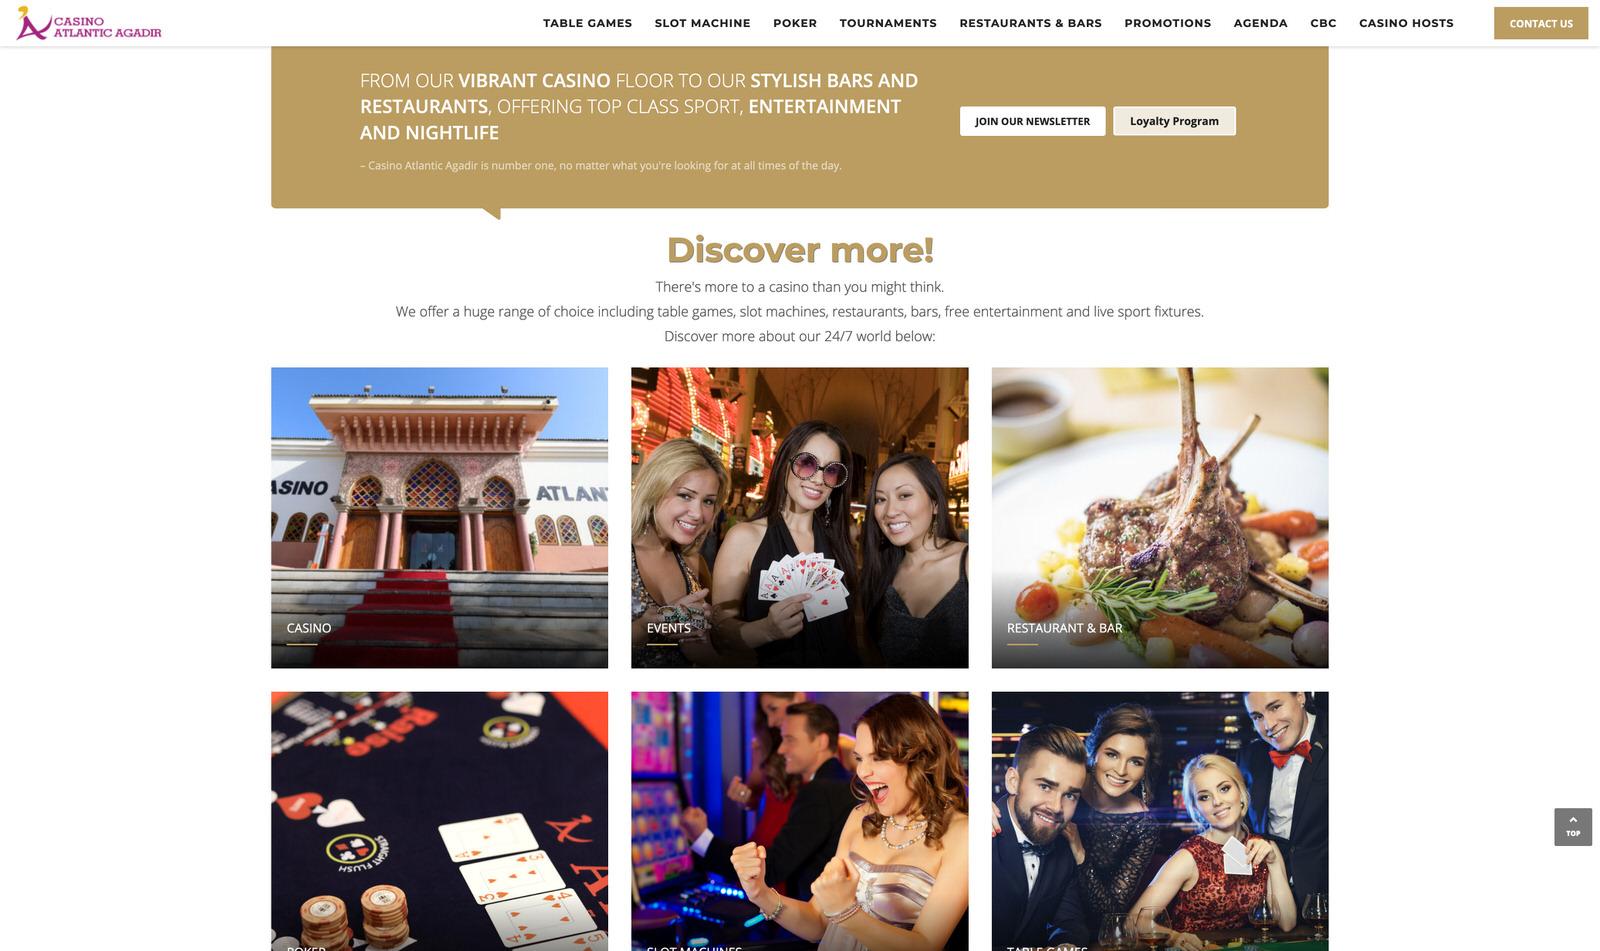 iCom-Agence-de-Communication-au-Maroc-Casablanca-creation-site-web-casini-atlantic-agadir2020-05-25 at 11.39.27 PM 2